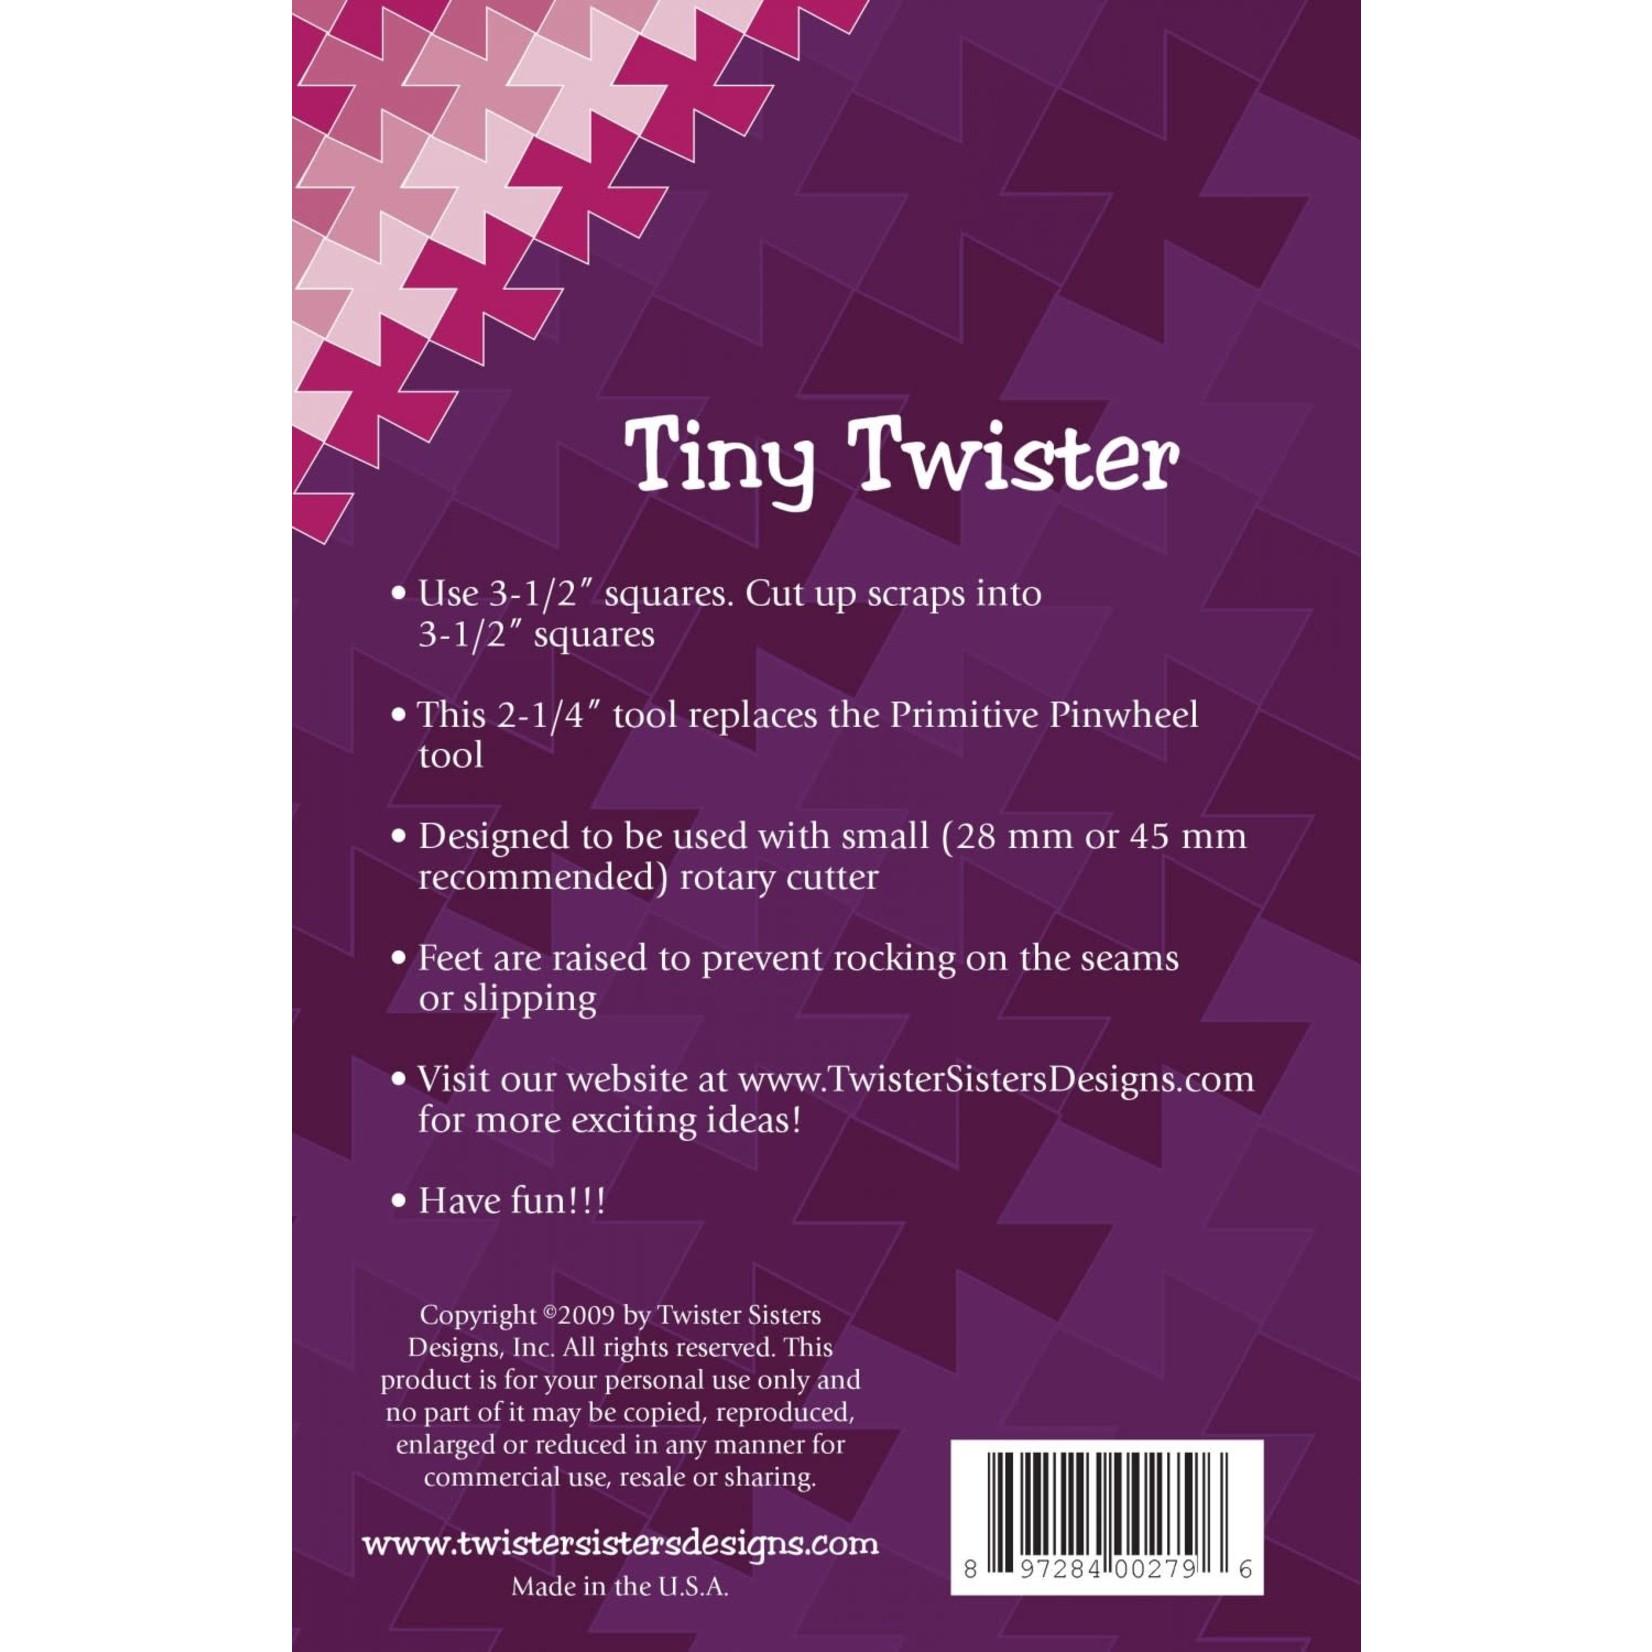 Twister Sisters Tiny Twister Pinwheel Ruler